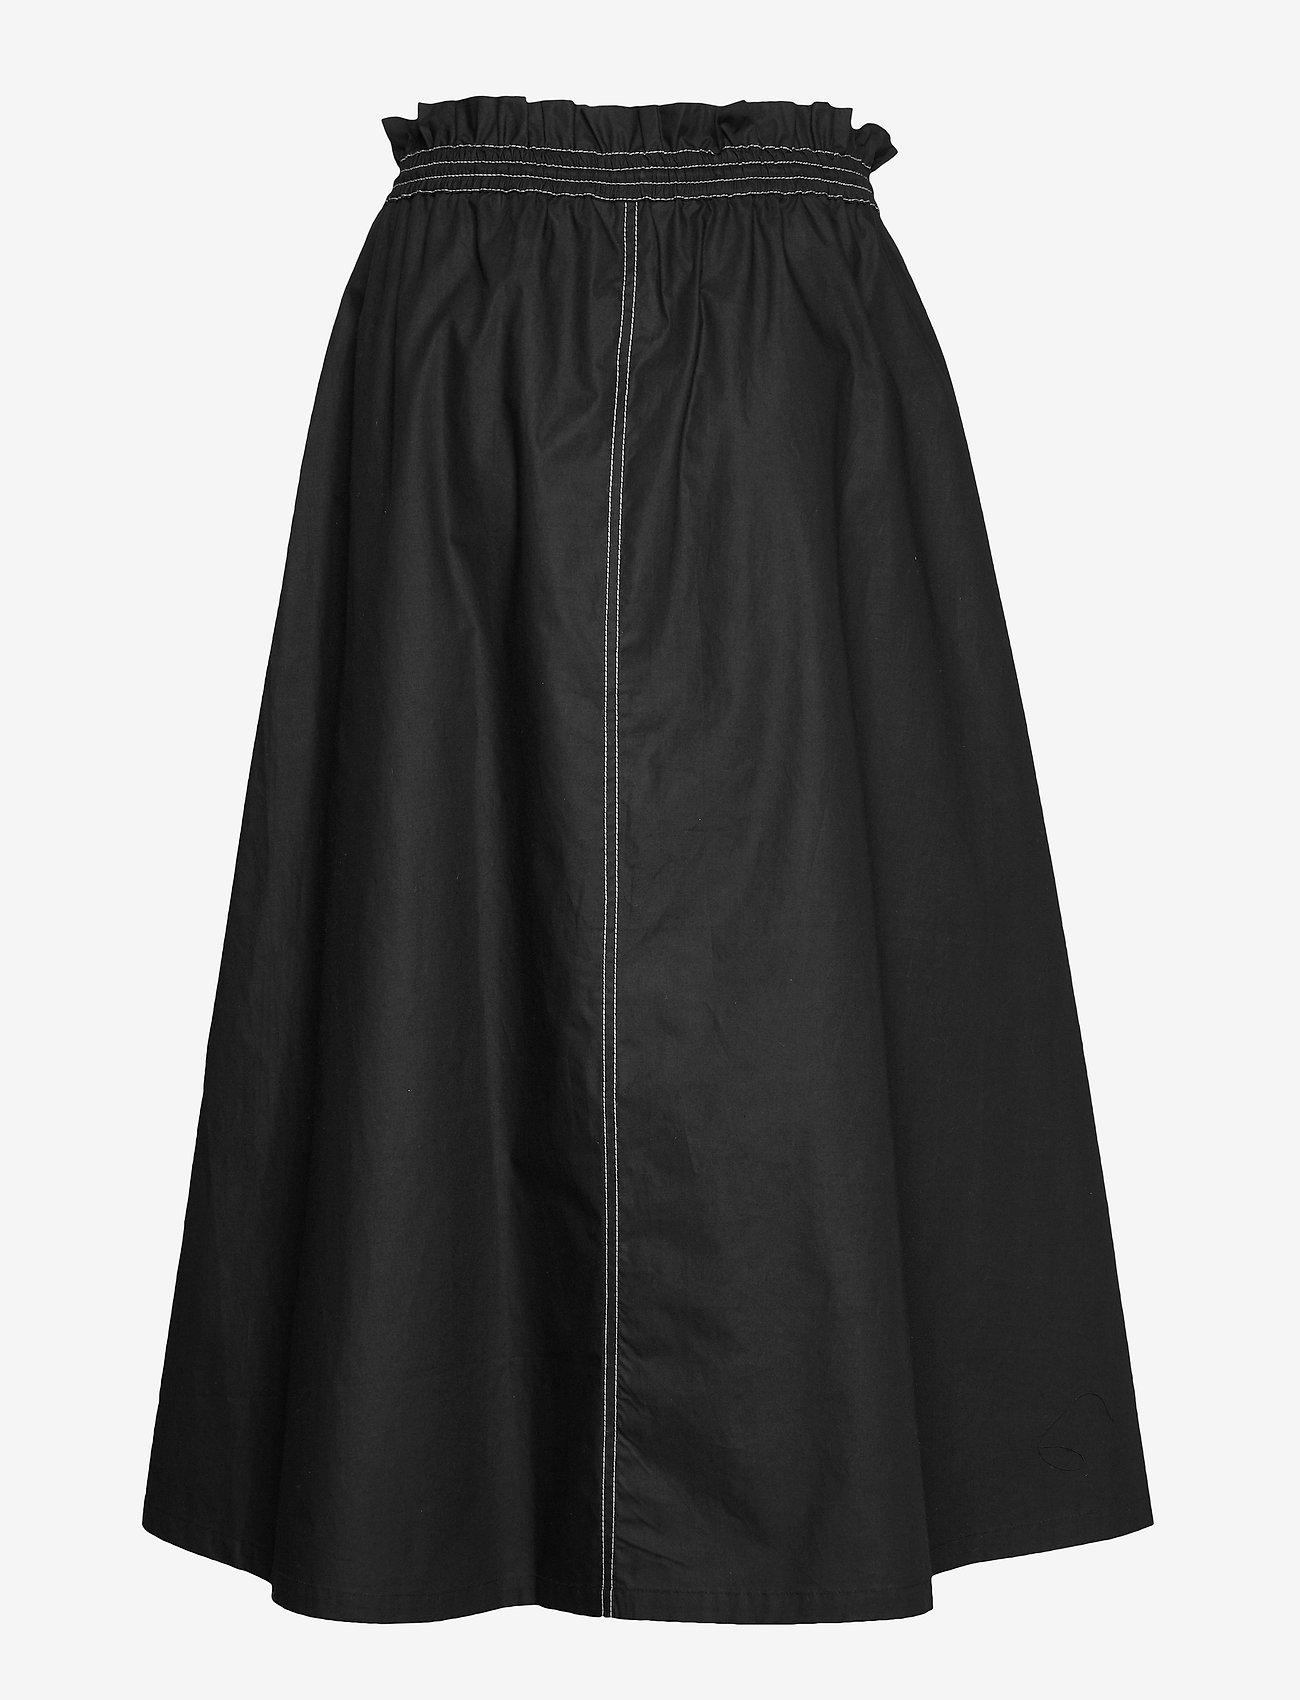 Entopaz Skirt 6691 (Black) - Envii 68e4oz